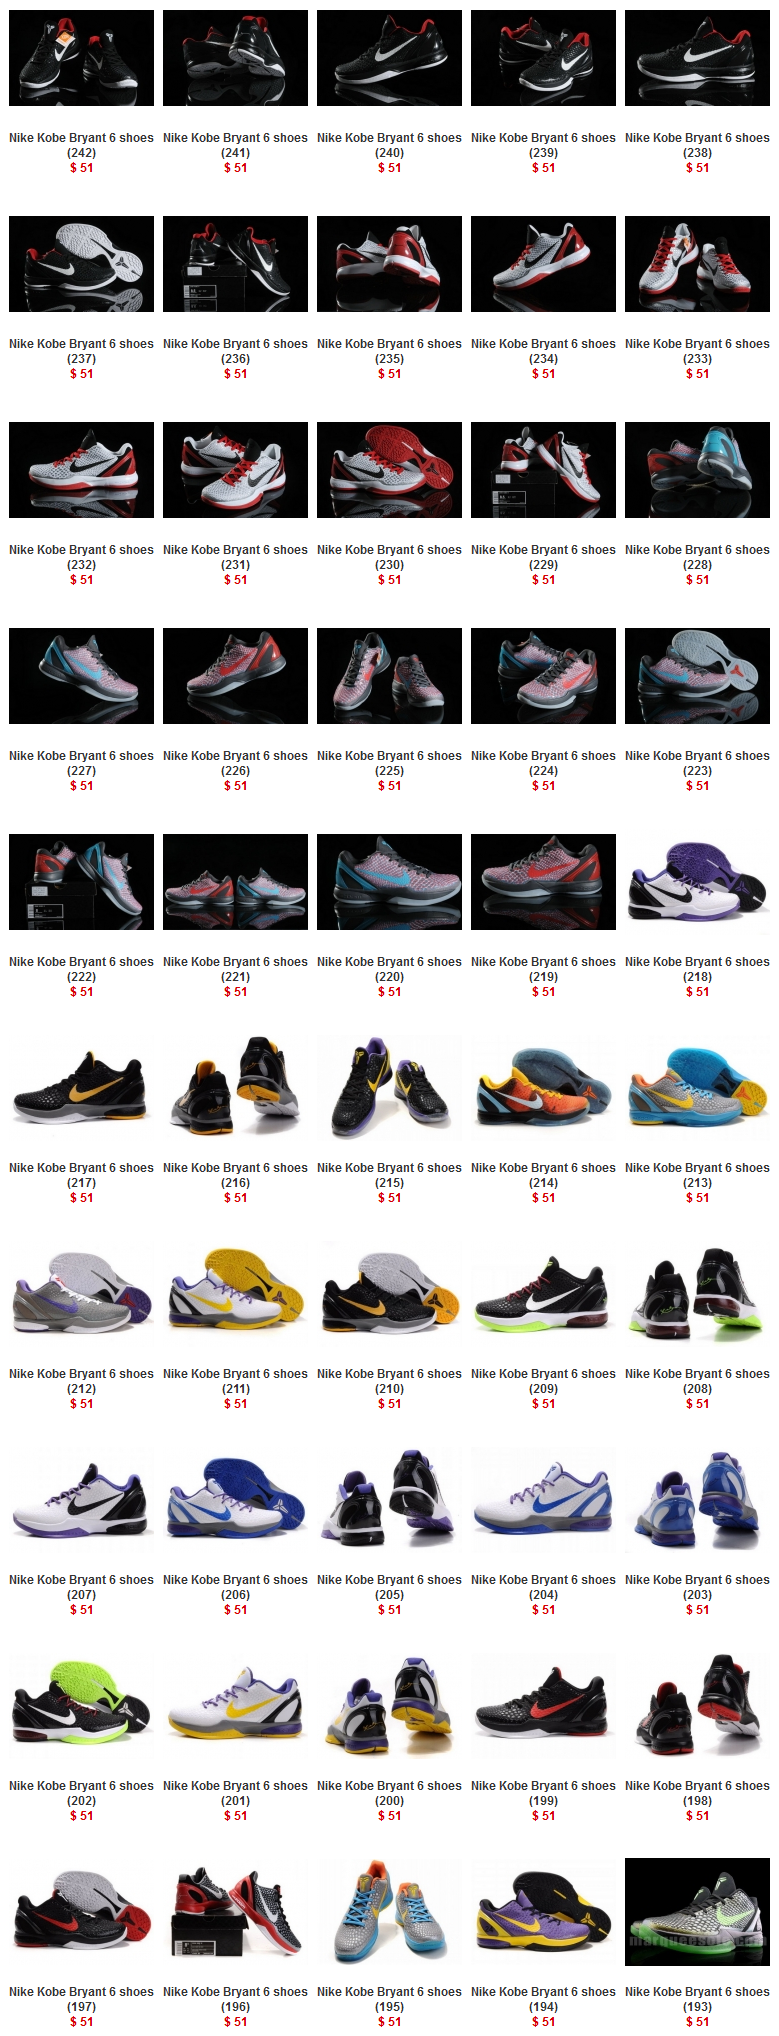 Nike Kobe Bryant 6 shoes page 1 | Nike